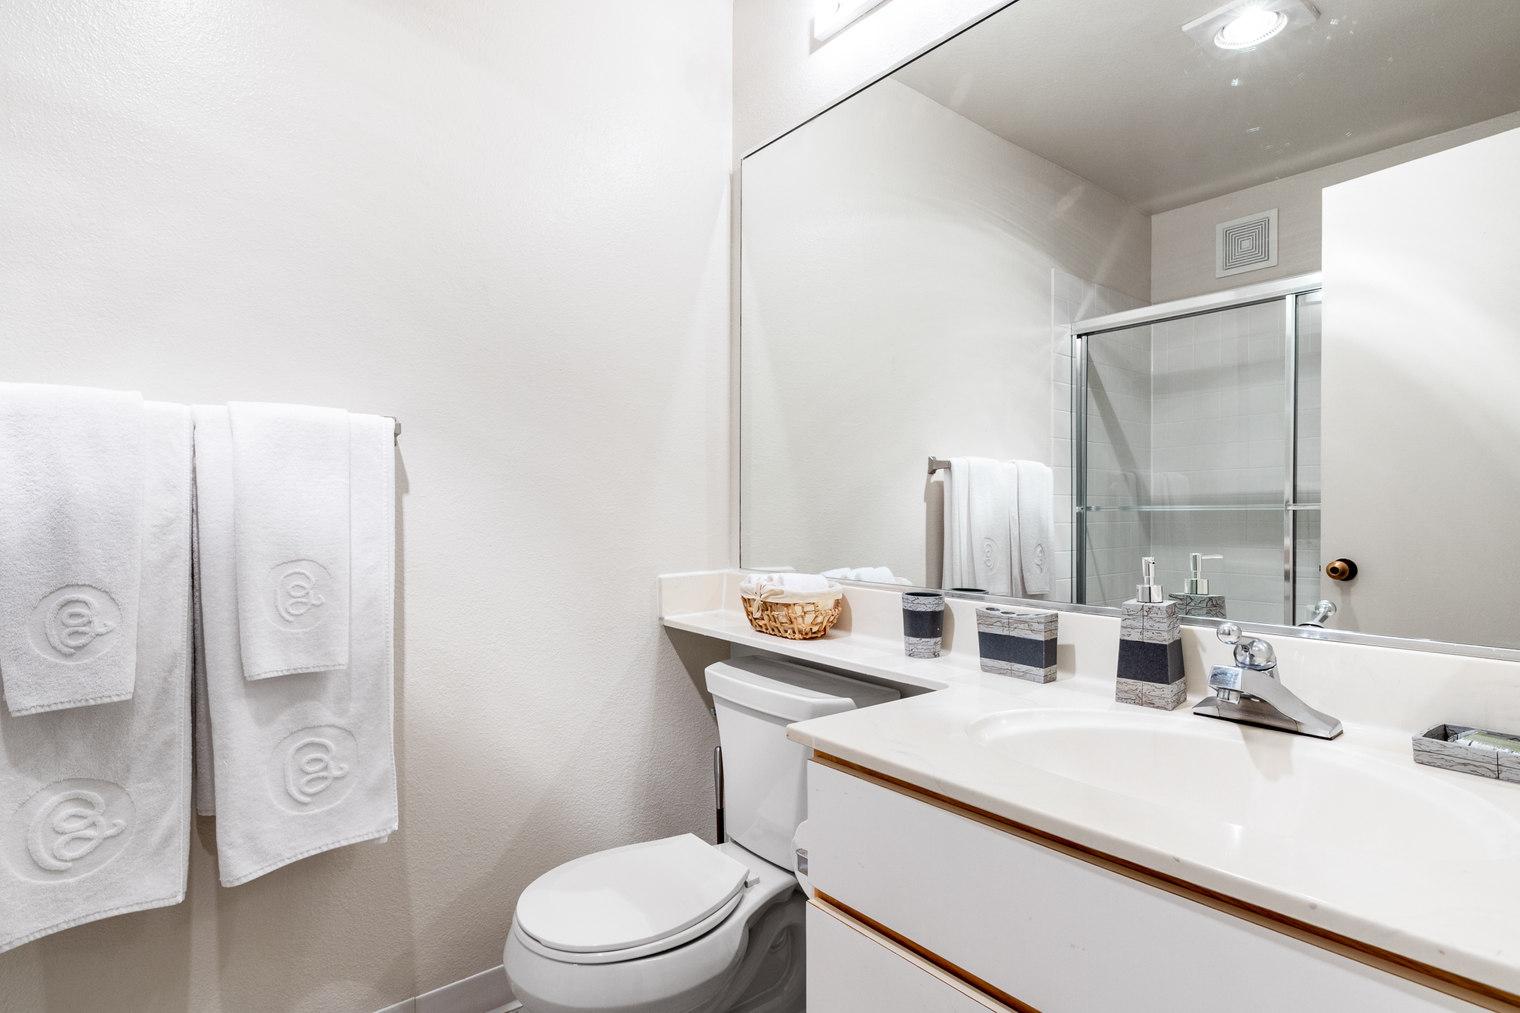 Bathroom at Bayside Village Place